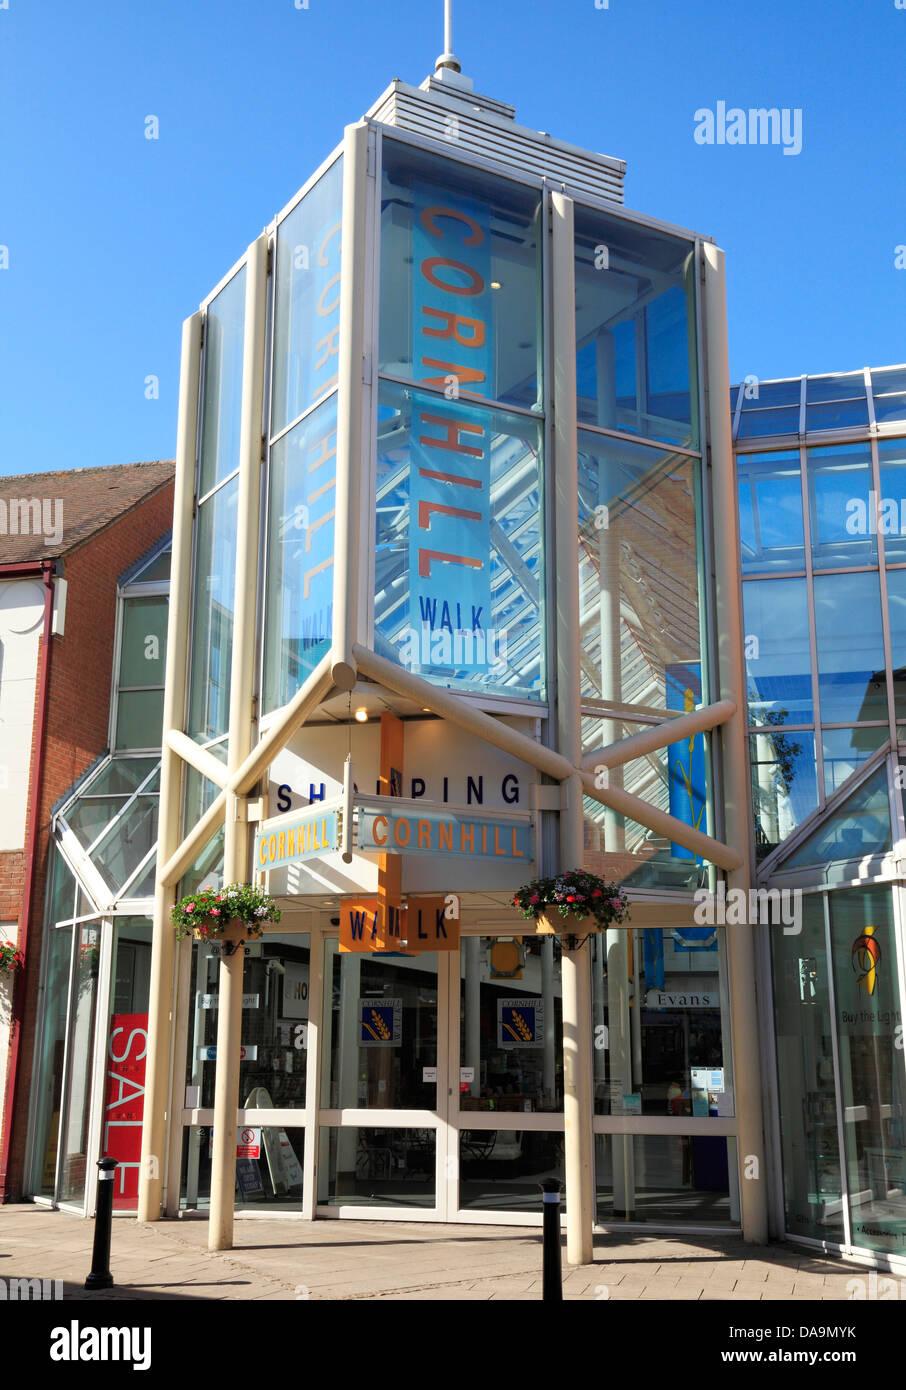 Bury St. Edmunds, Cornhill Walk Shopping Centre, Mall, Suffolk, England UK - Stock Image